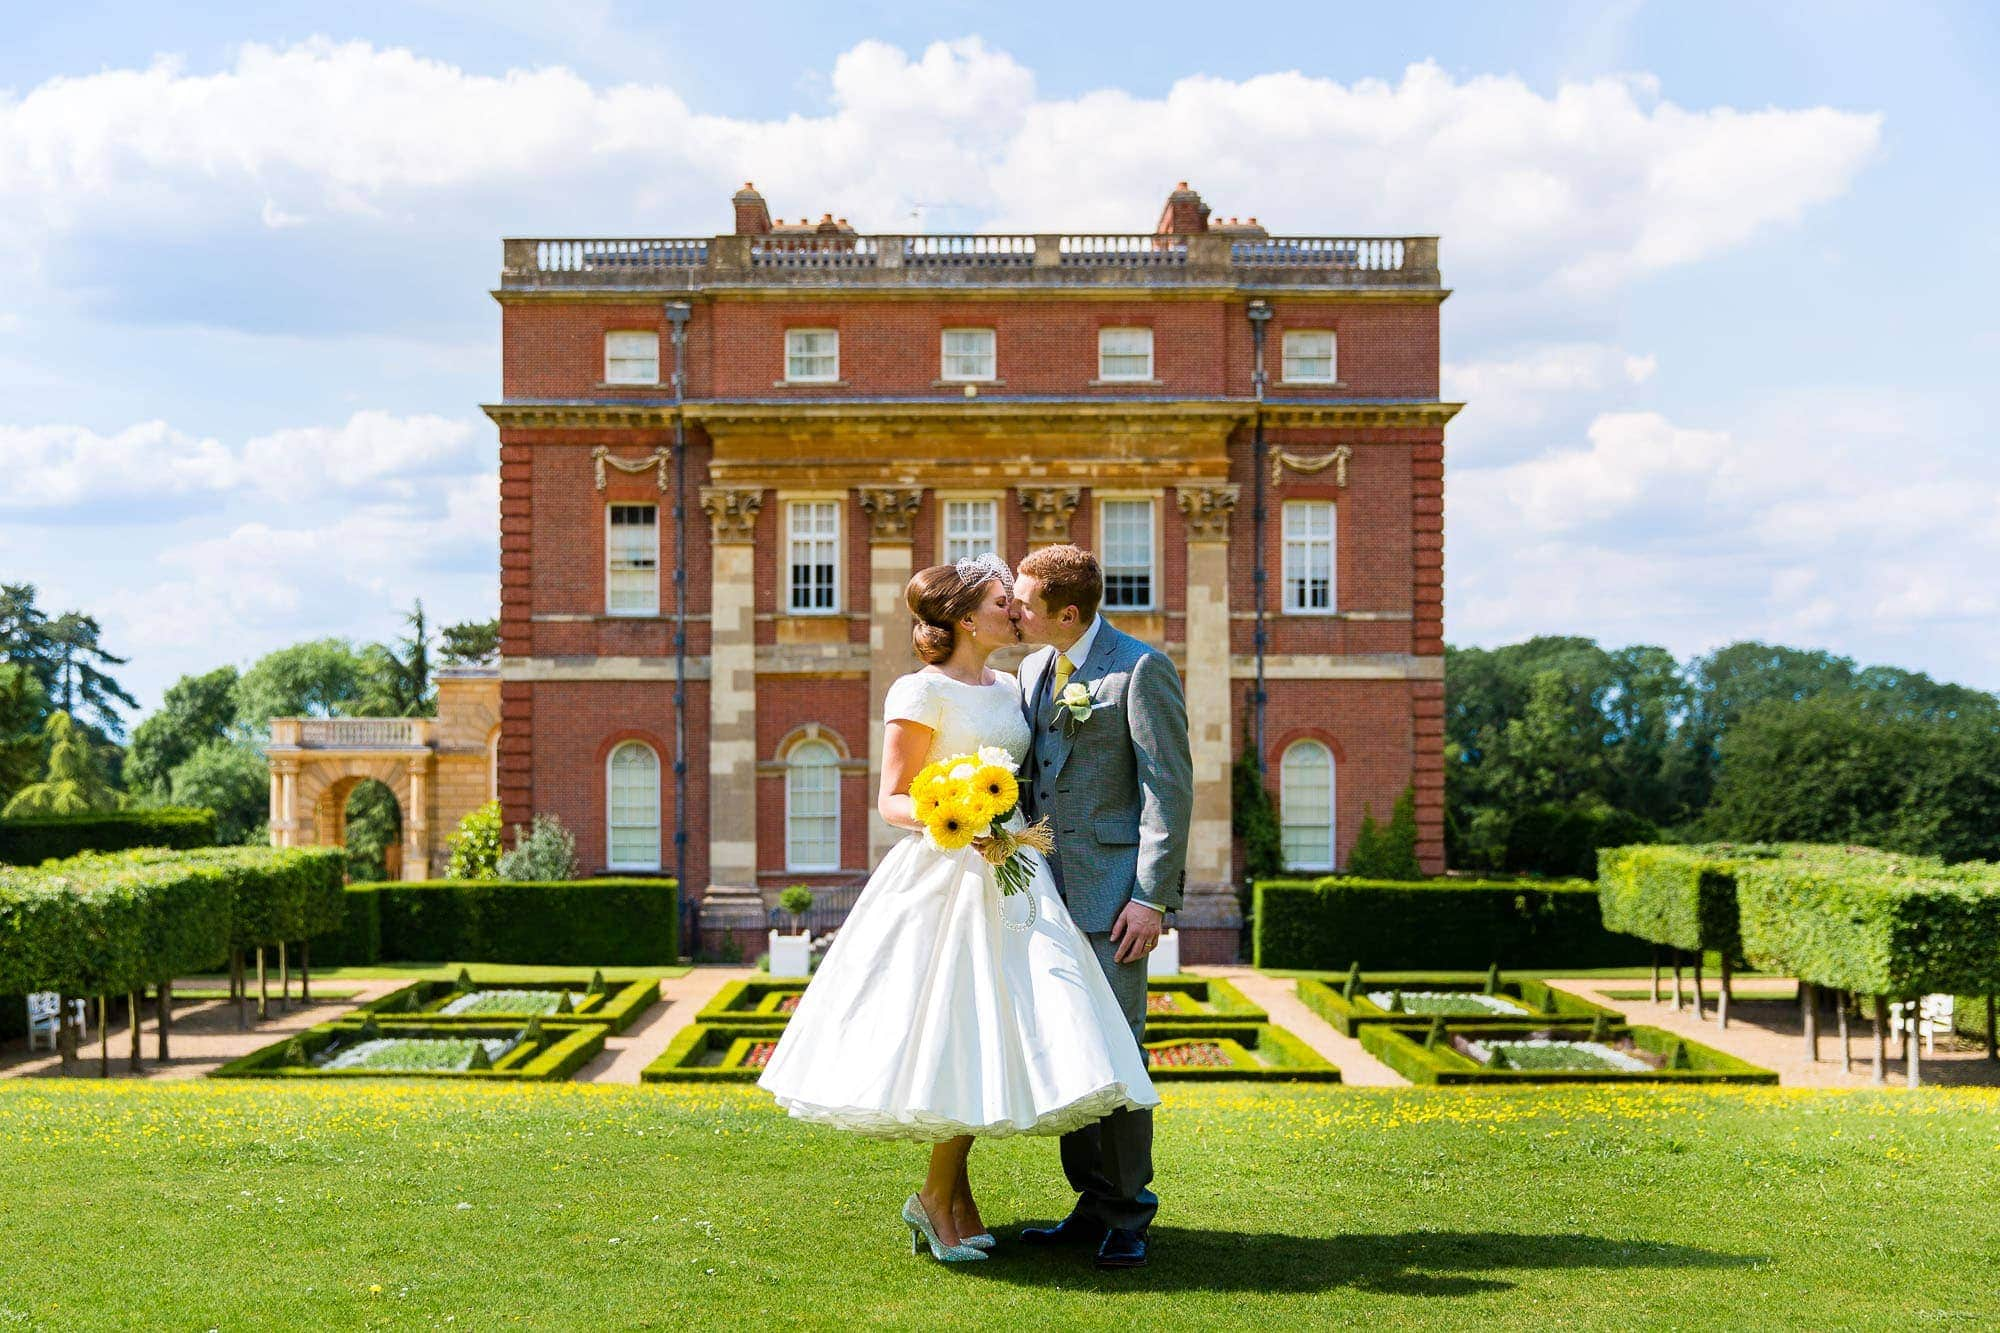 Clandon Park Wedding Photographer 65 5893